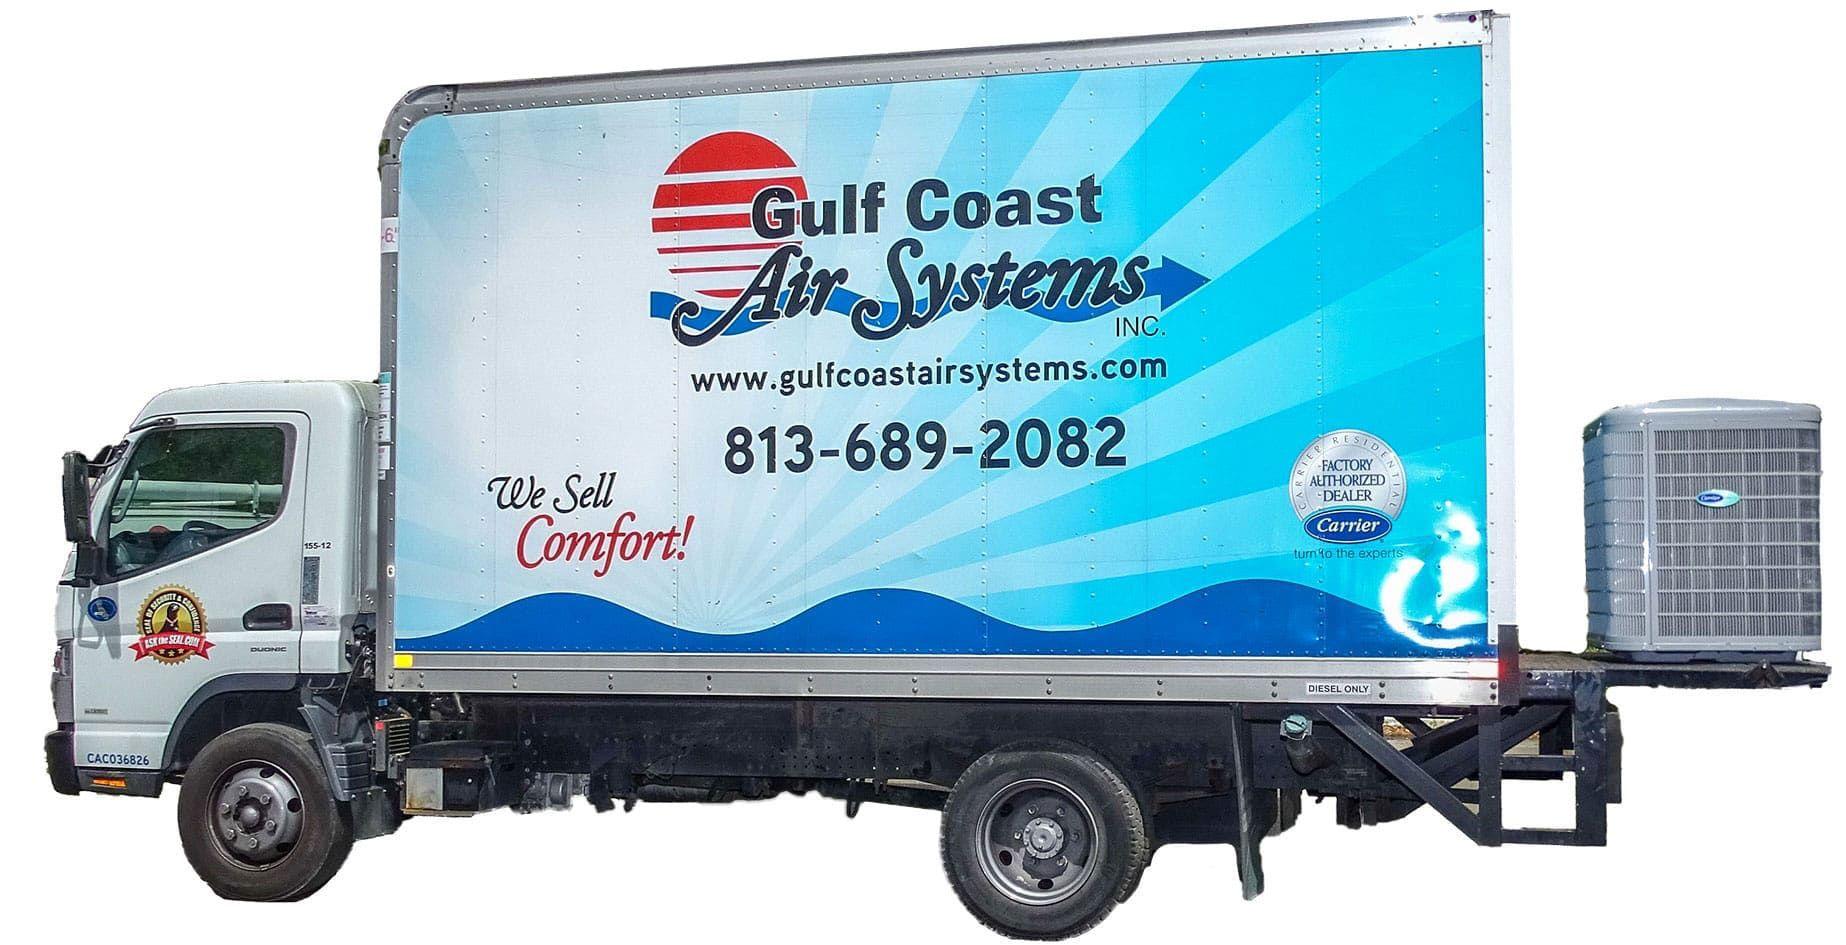 AC Repair Tampa Air conditioner repair, Air conditioning